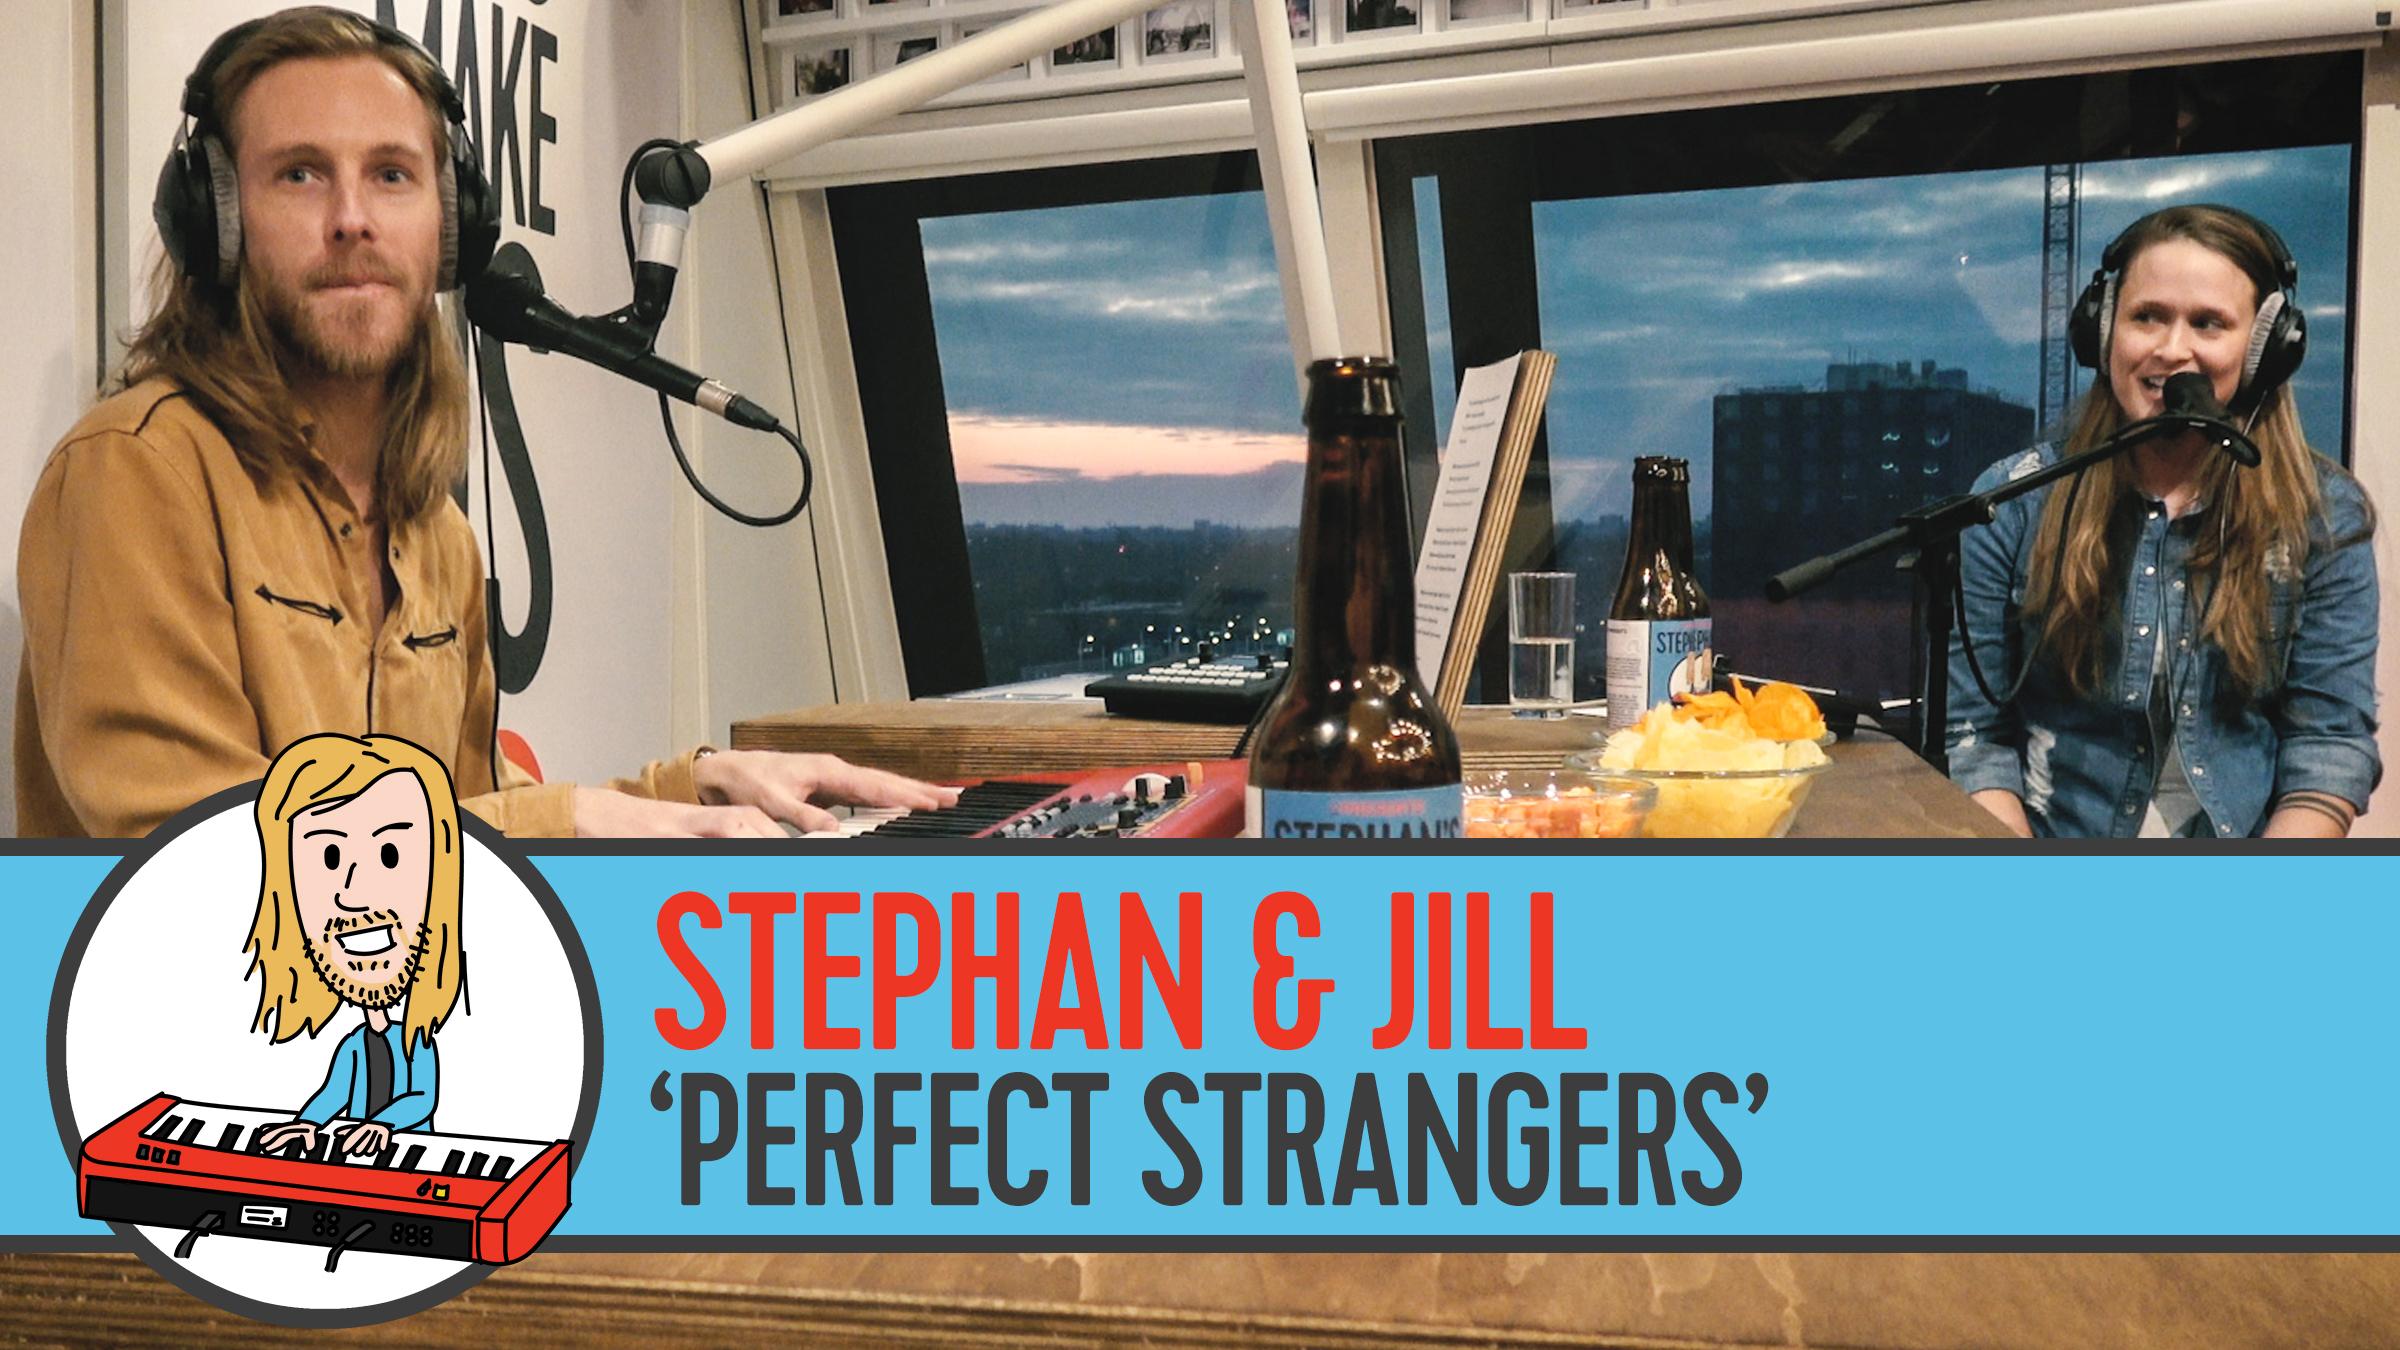 Jill   perfect strangers   thumb v1